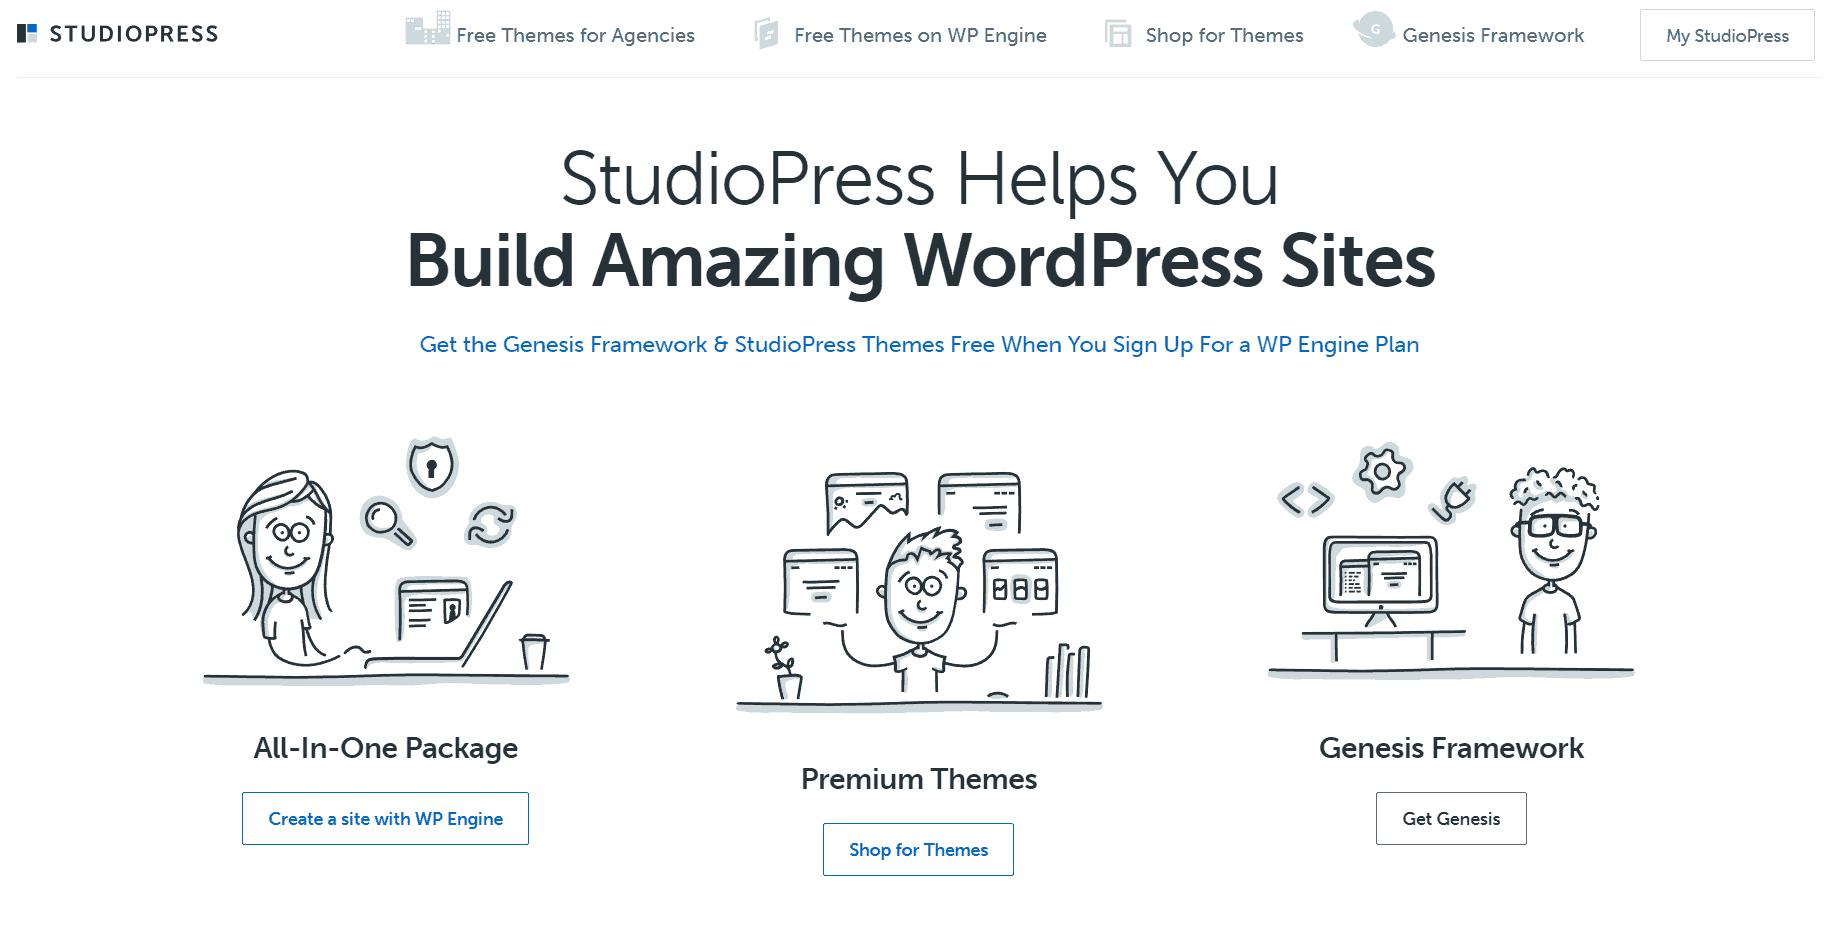 studiopress themes